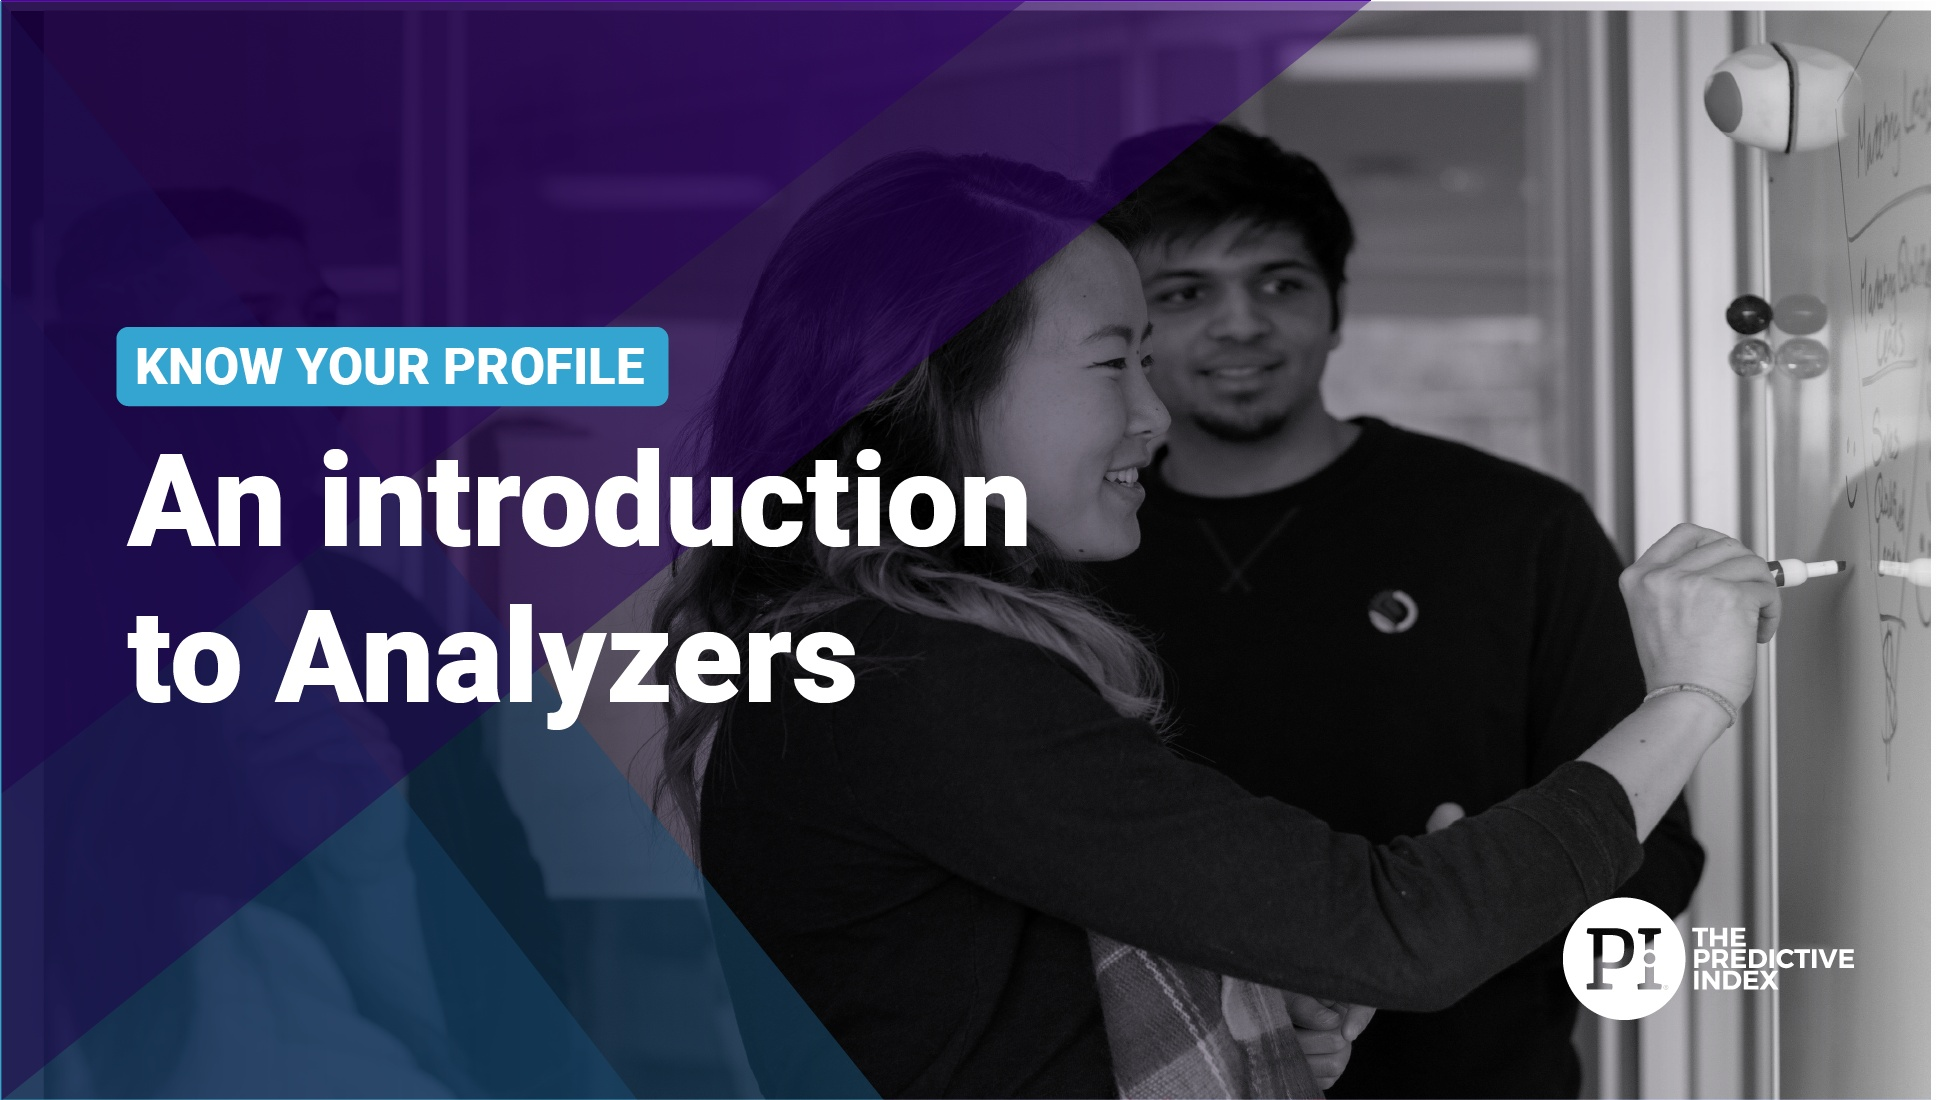 Introducing the Analyzer